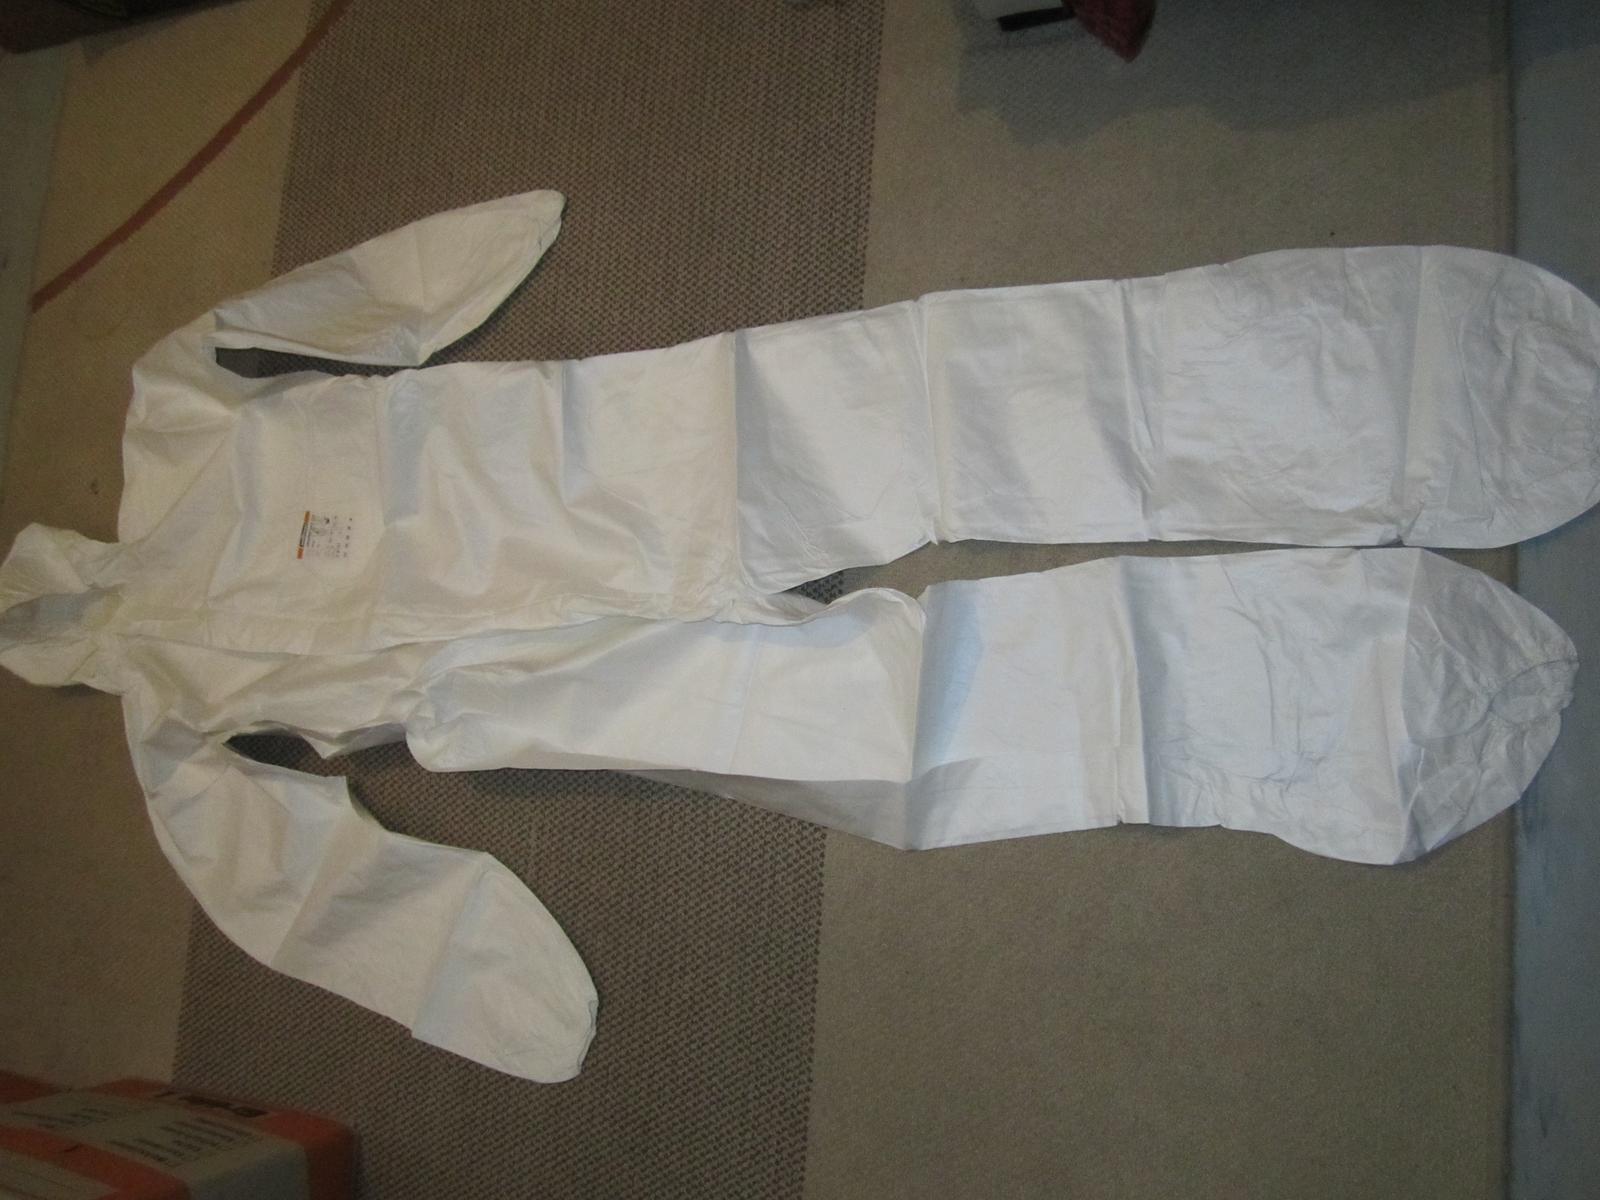 Ochranné oblečenie zetdress-secutex typ 5/6 - Obrázok č. 1